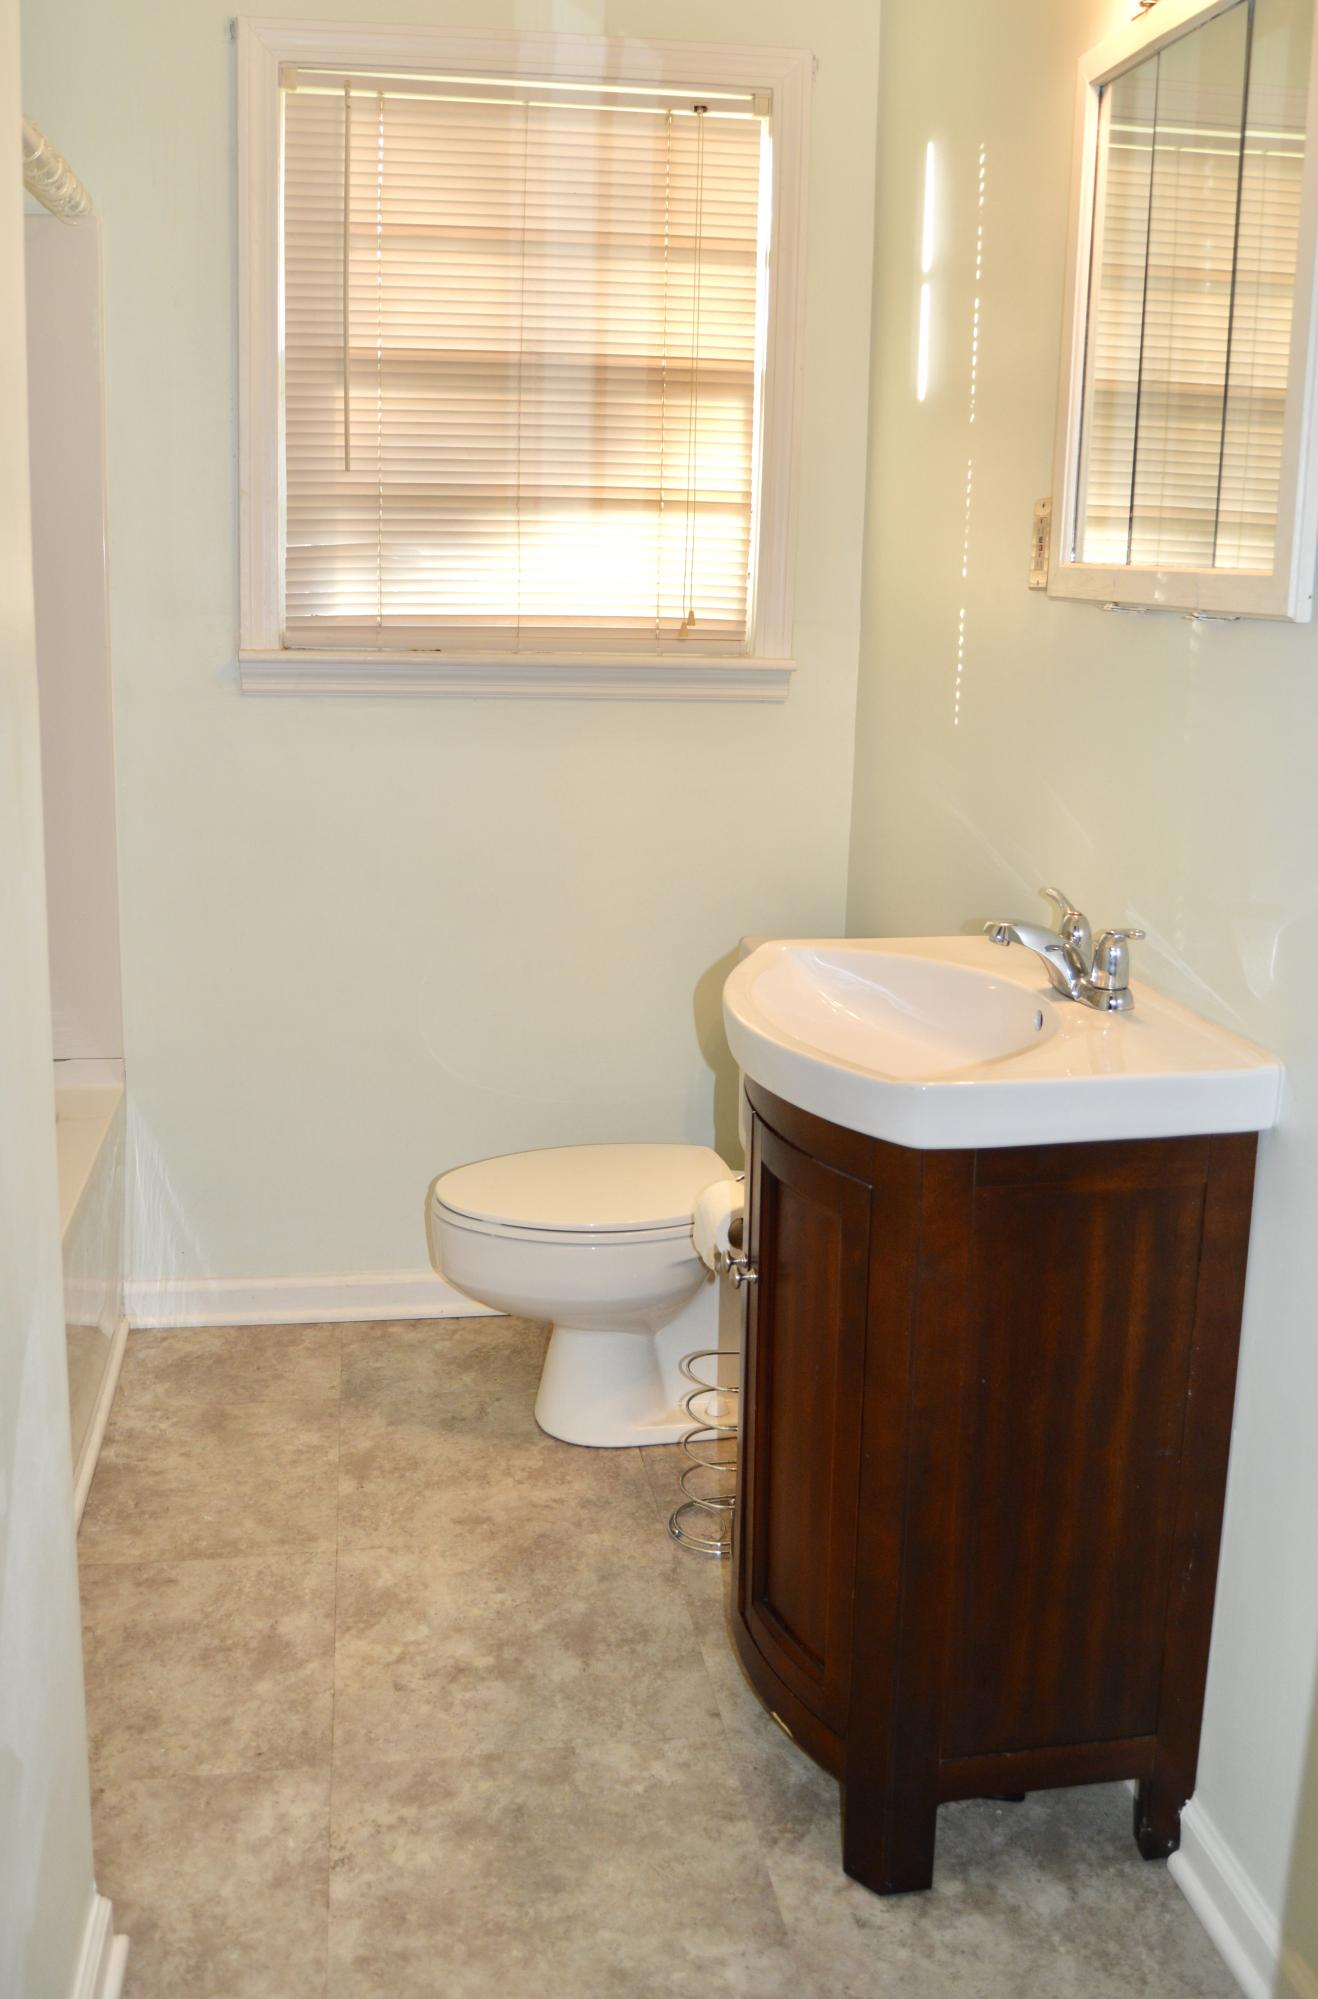 Owens Homes For Sale - 111 Owens, Summerville, SC - 10